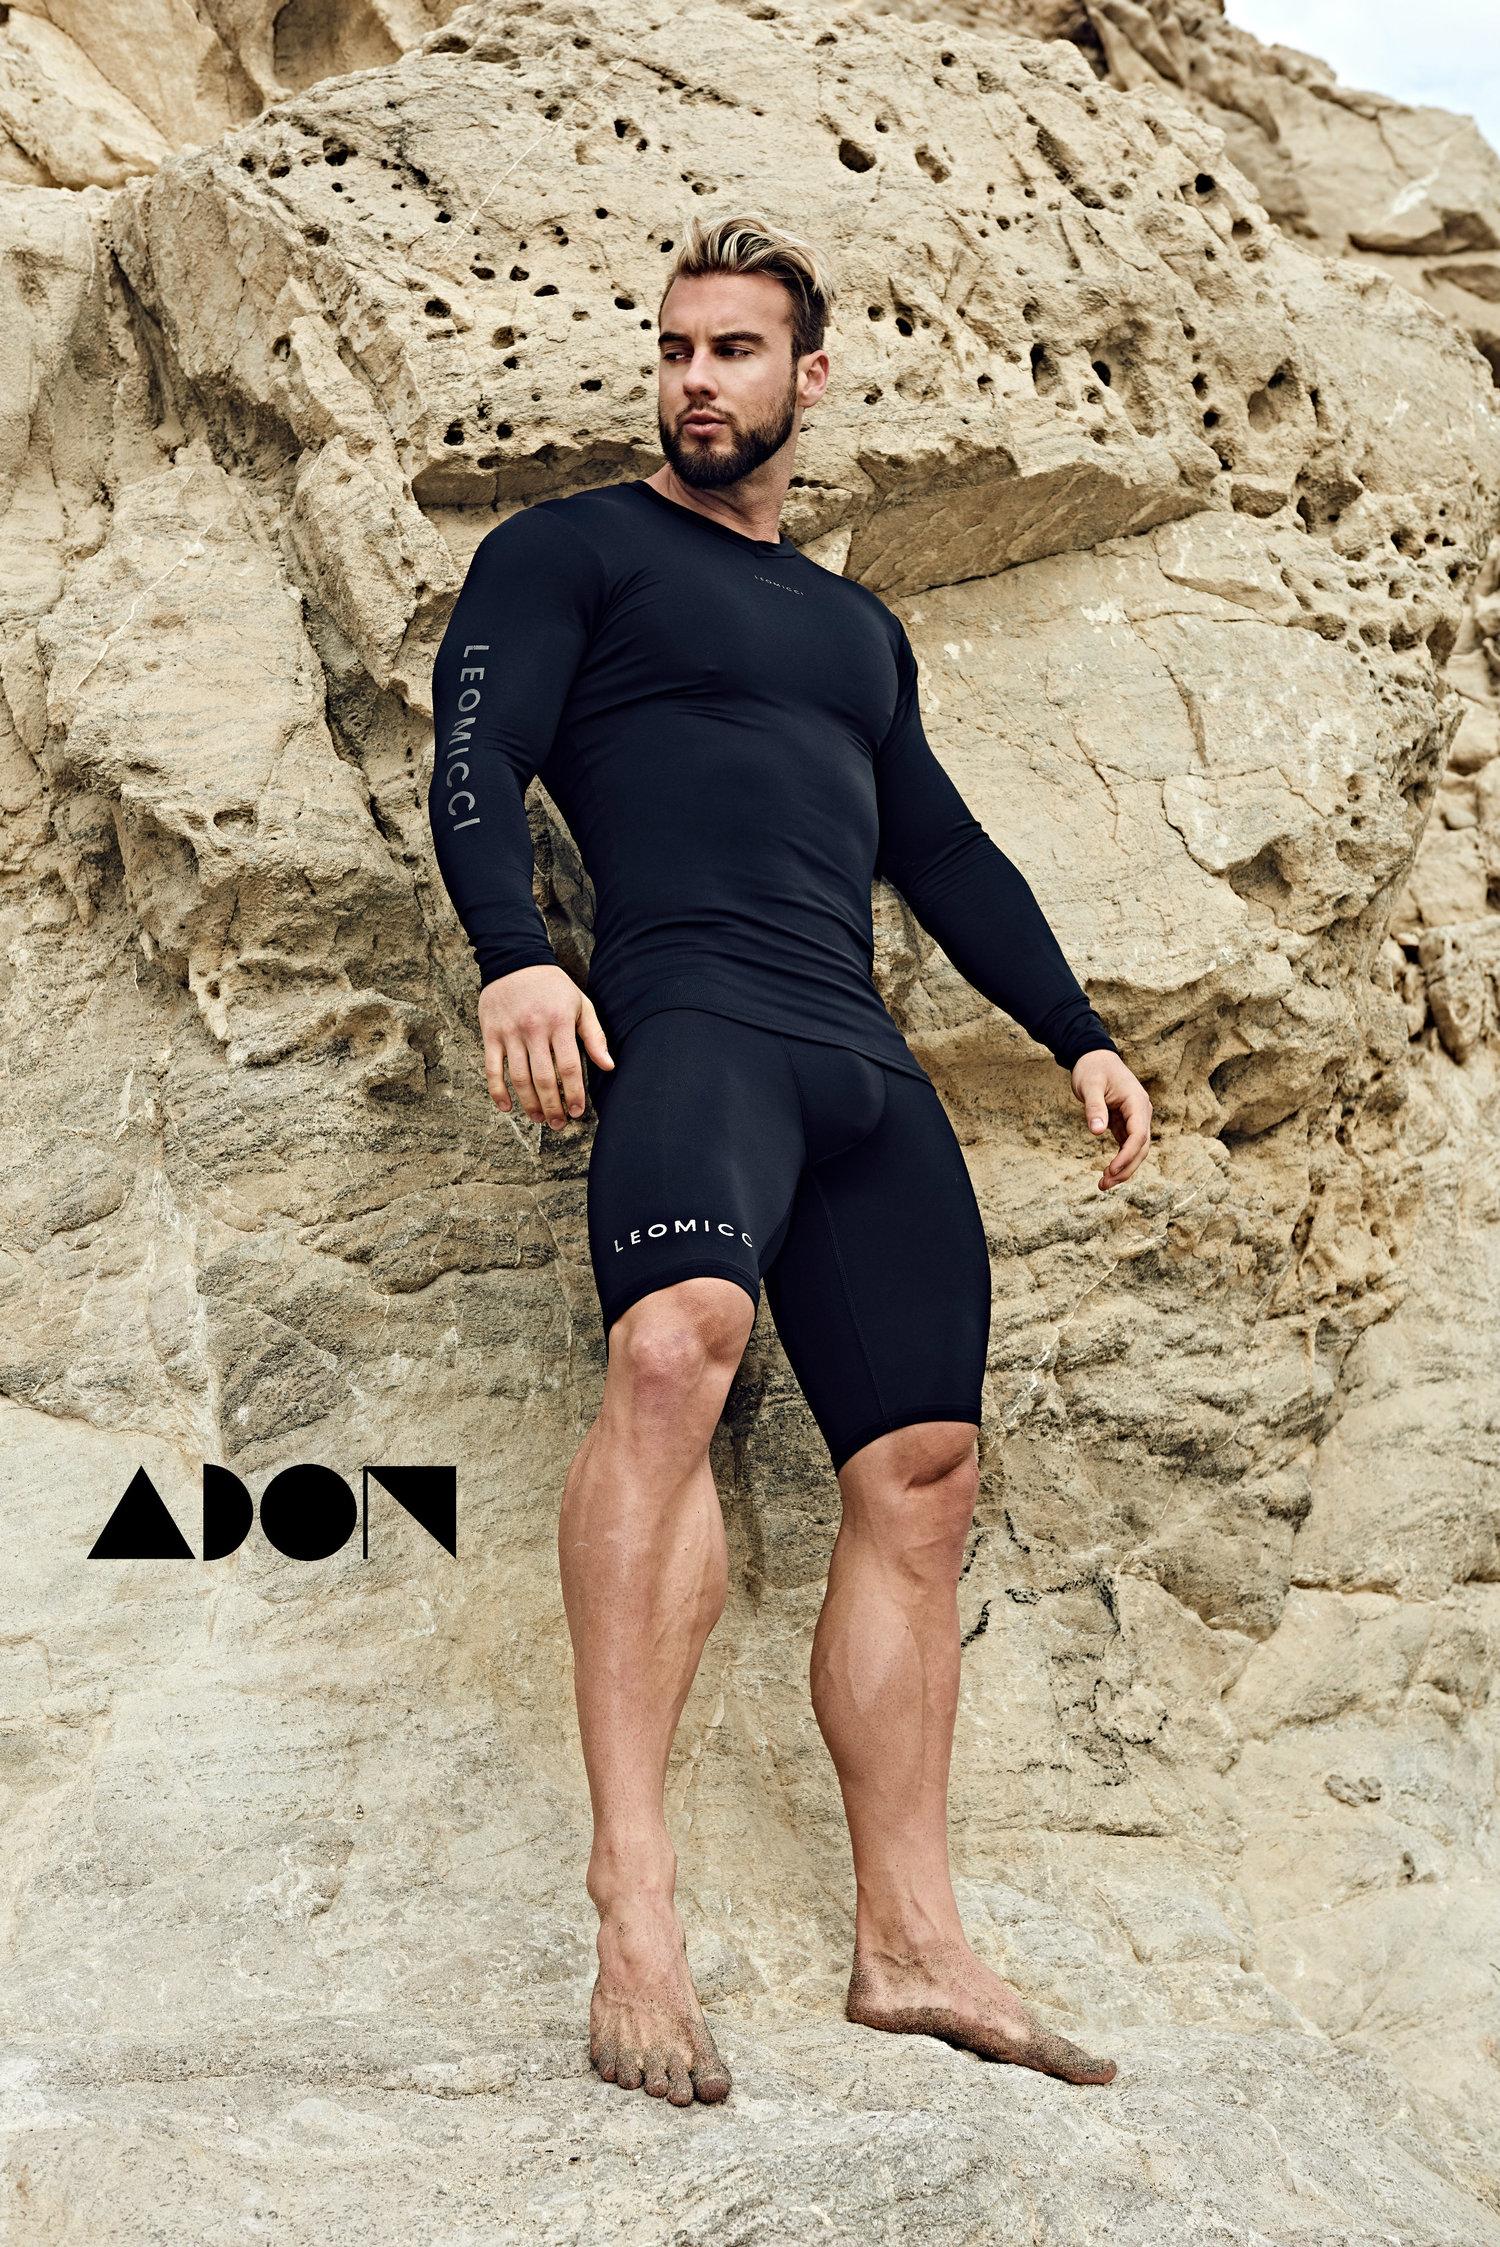 Adon Exclusive: Model Alfred Liebl